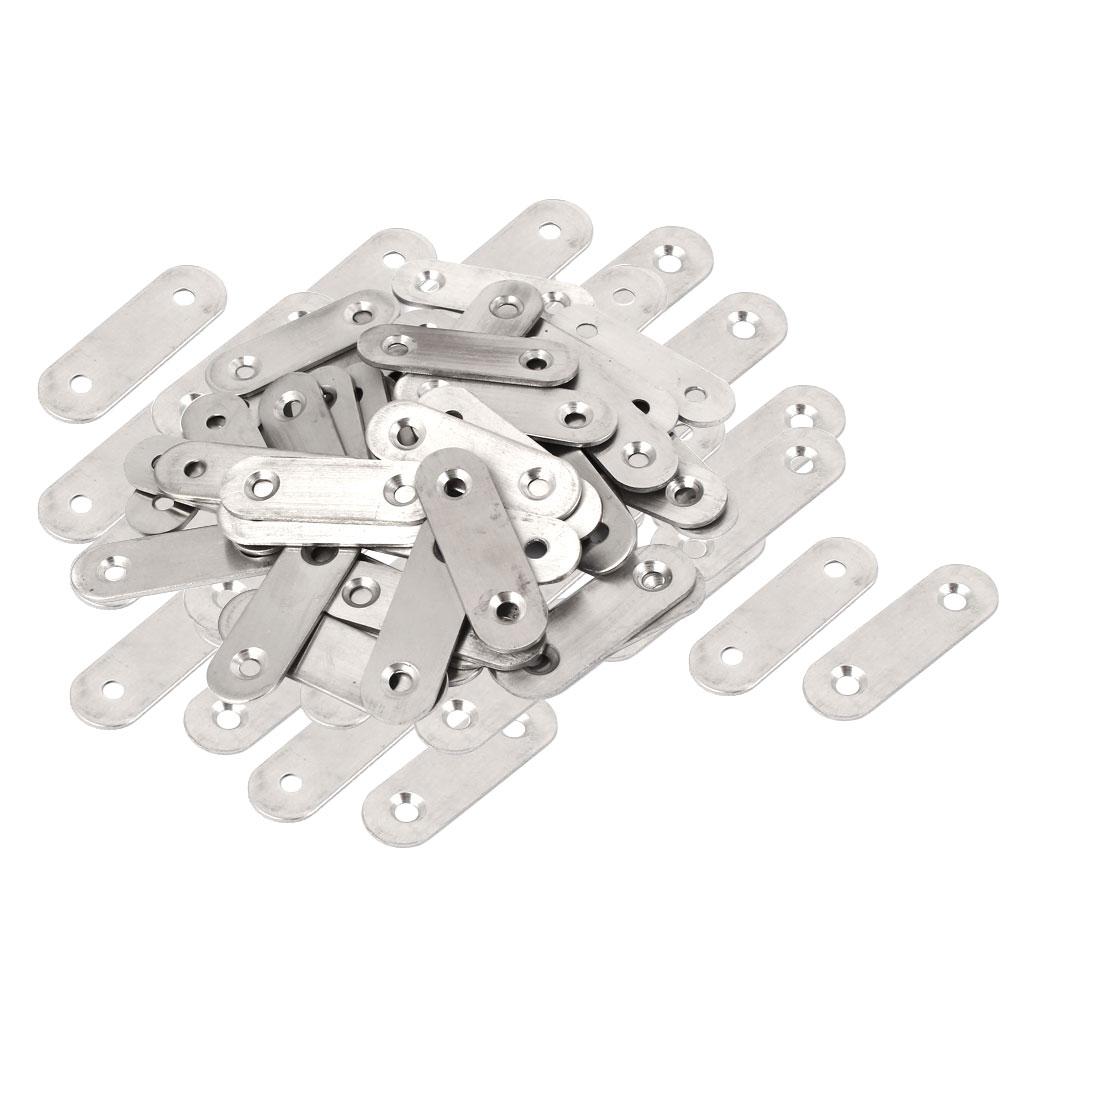 Metal Flat Repair Joining Brace Mending Fixing Plate 50mmx16mmx2mm 80pcs